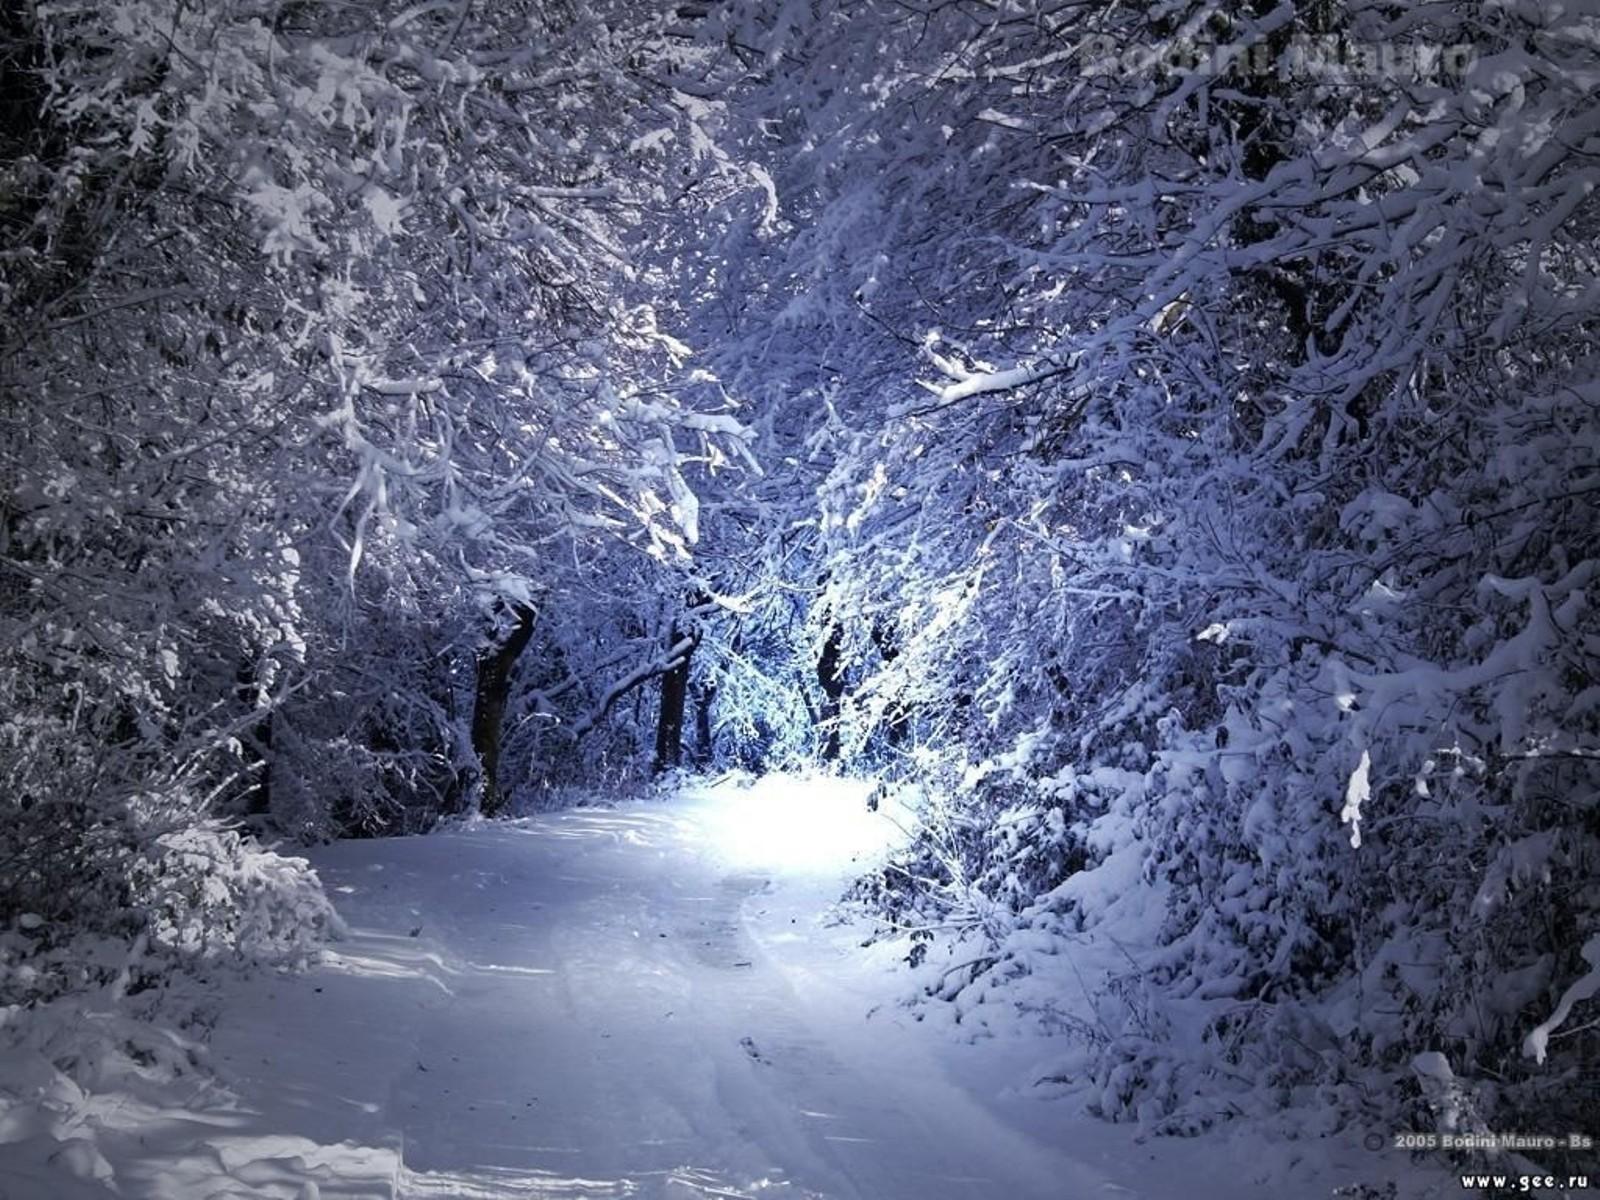 winter scenery winter scenery winter scenery 1600x1200